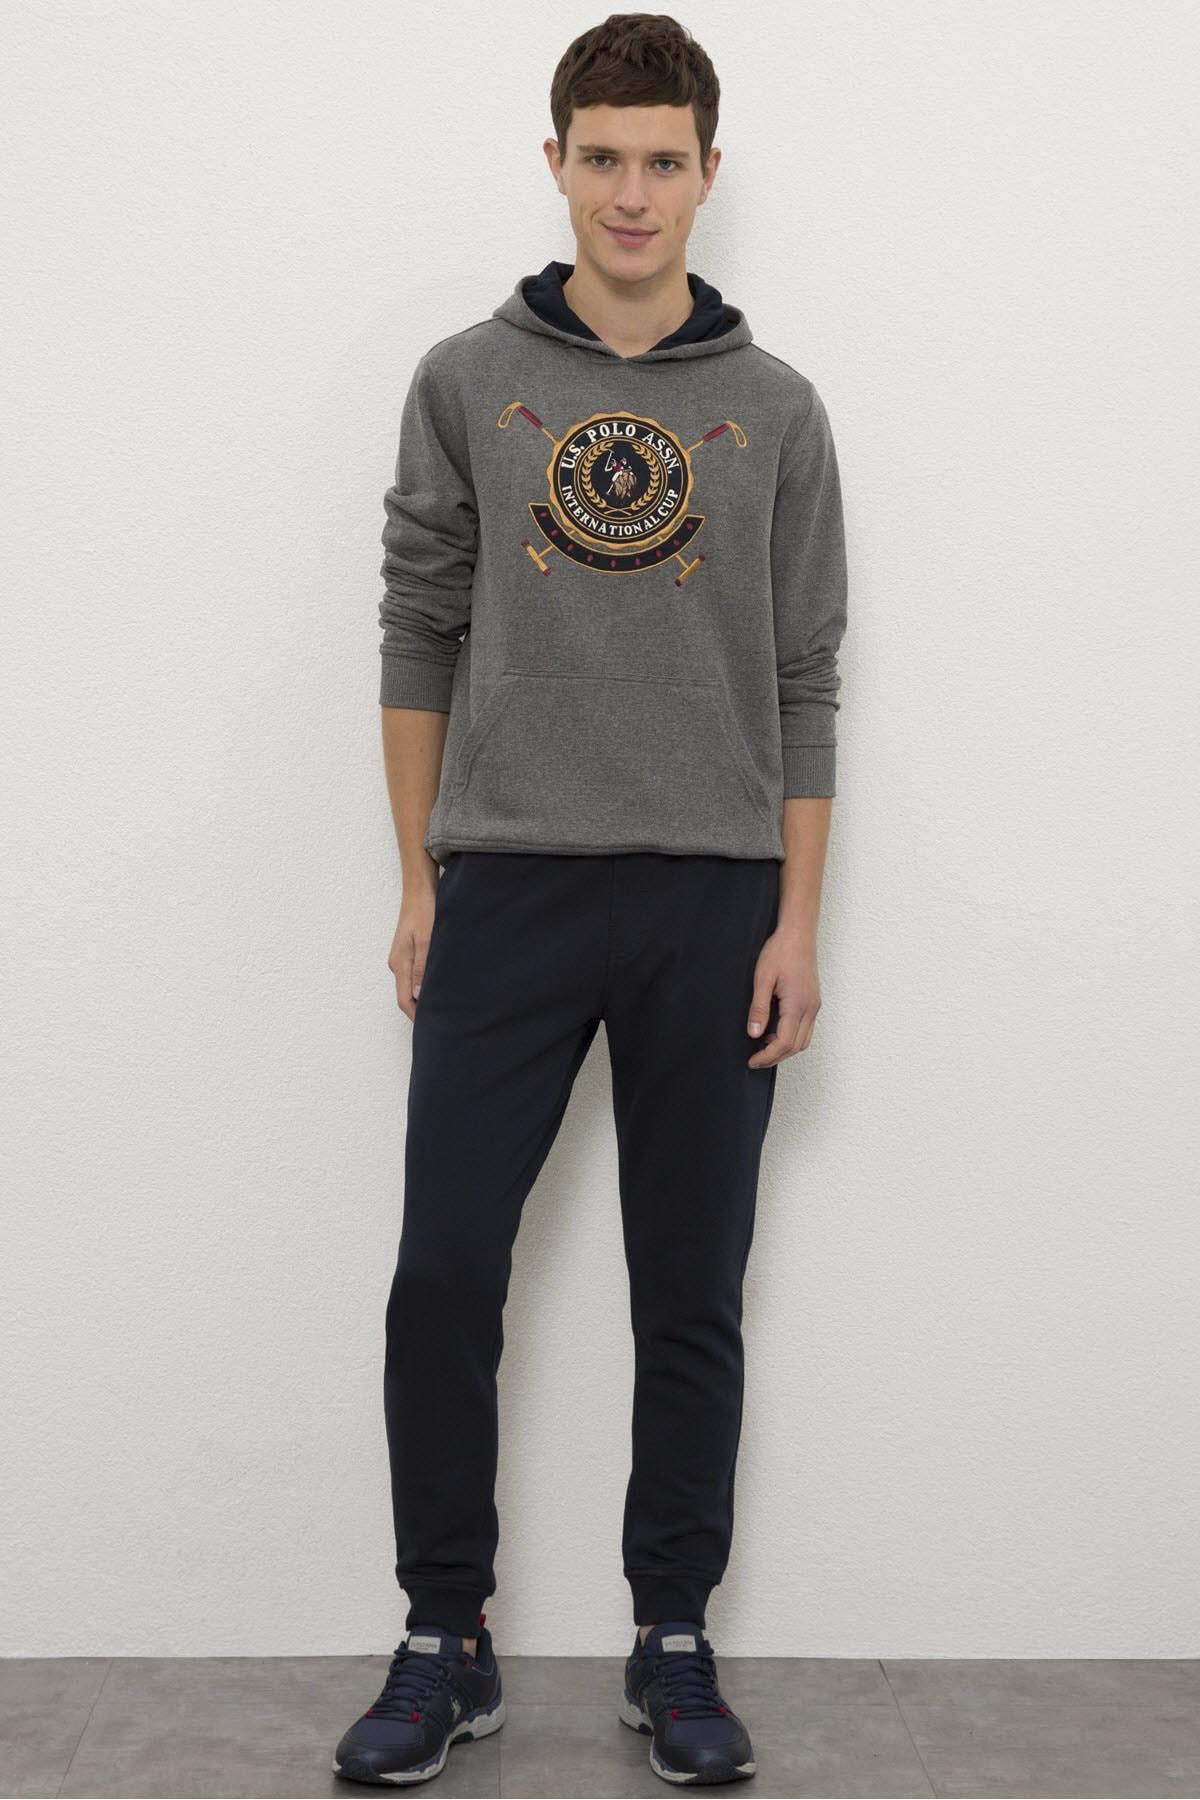 U.S. Polo Assn. Lacıvert Erkek Örme Pantolon 1